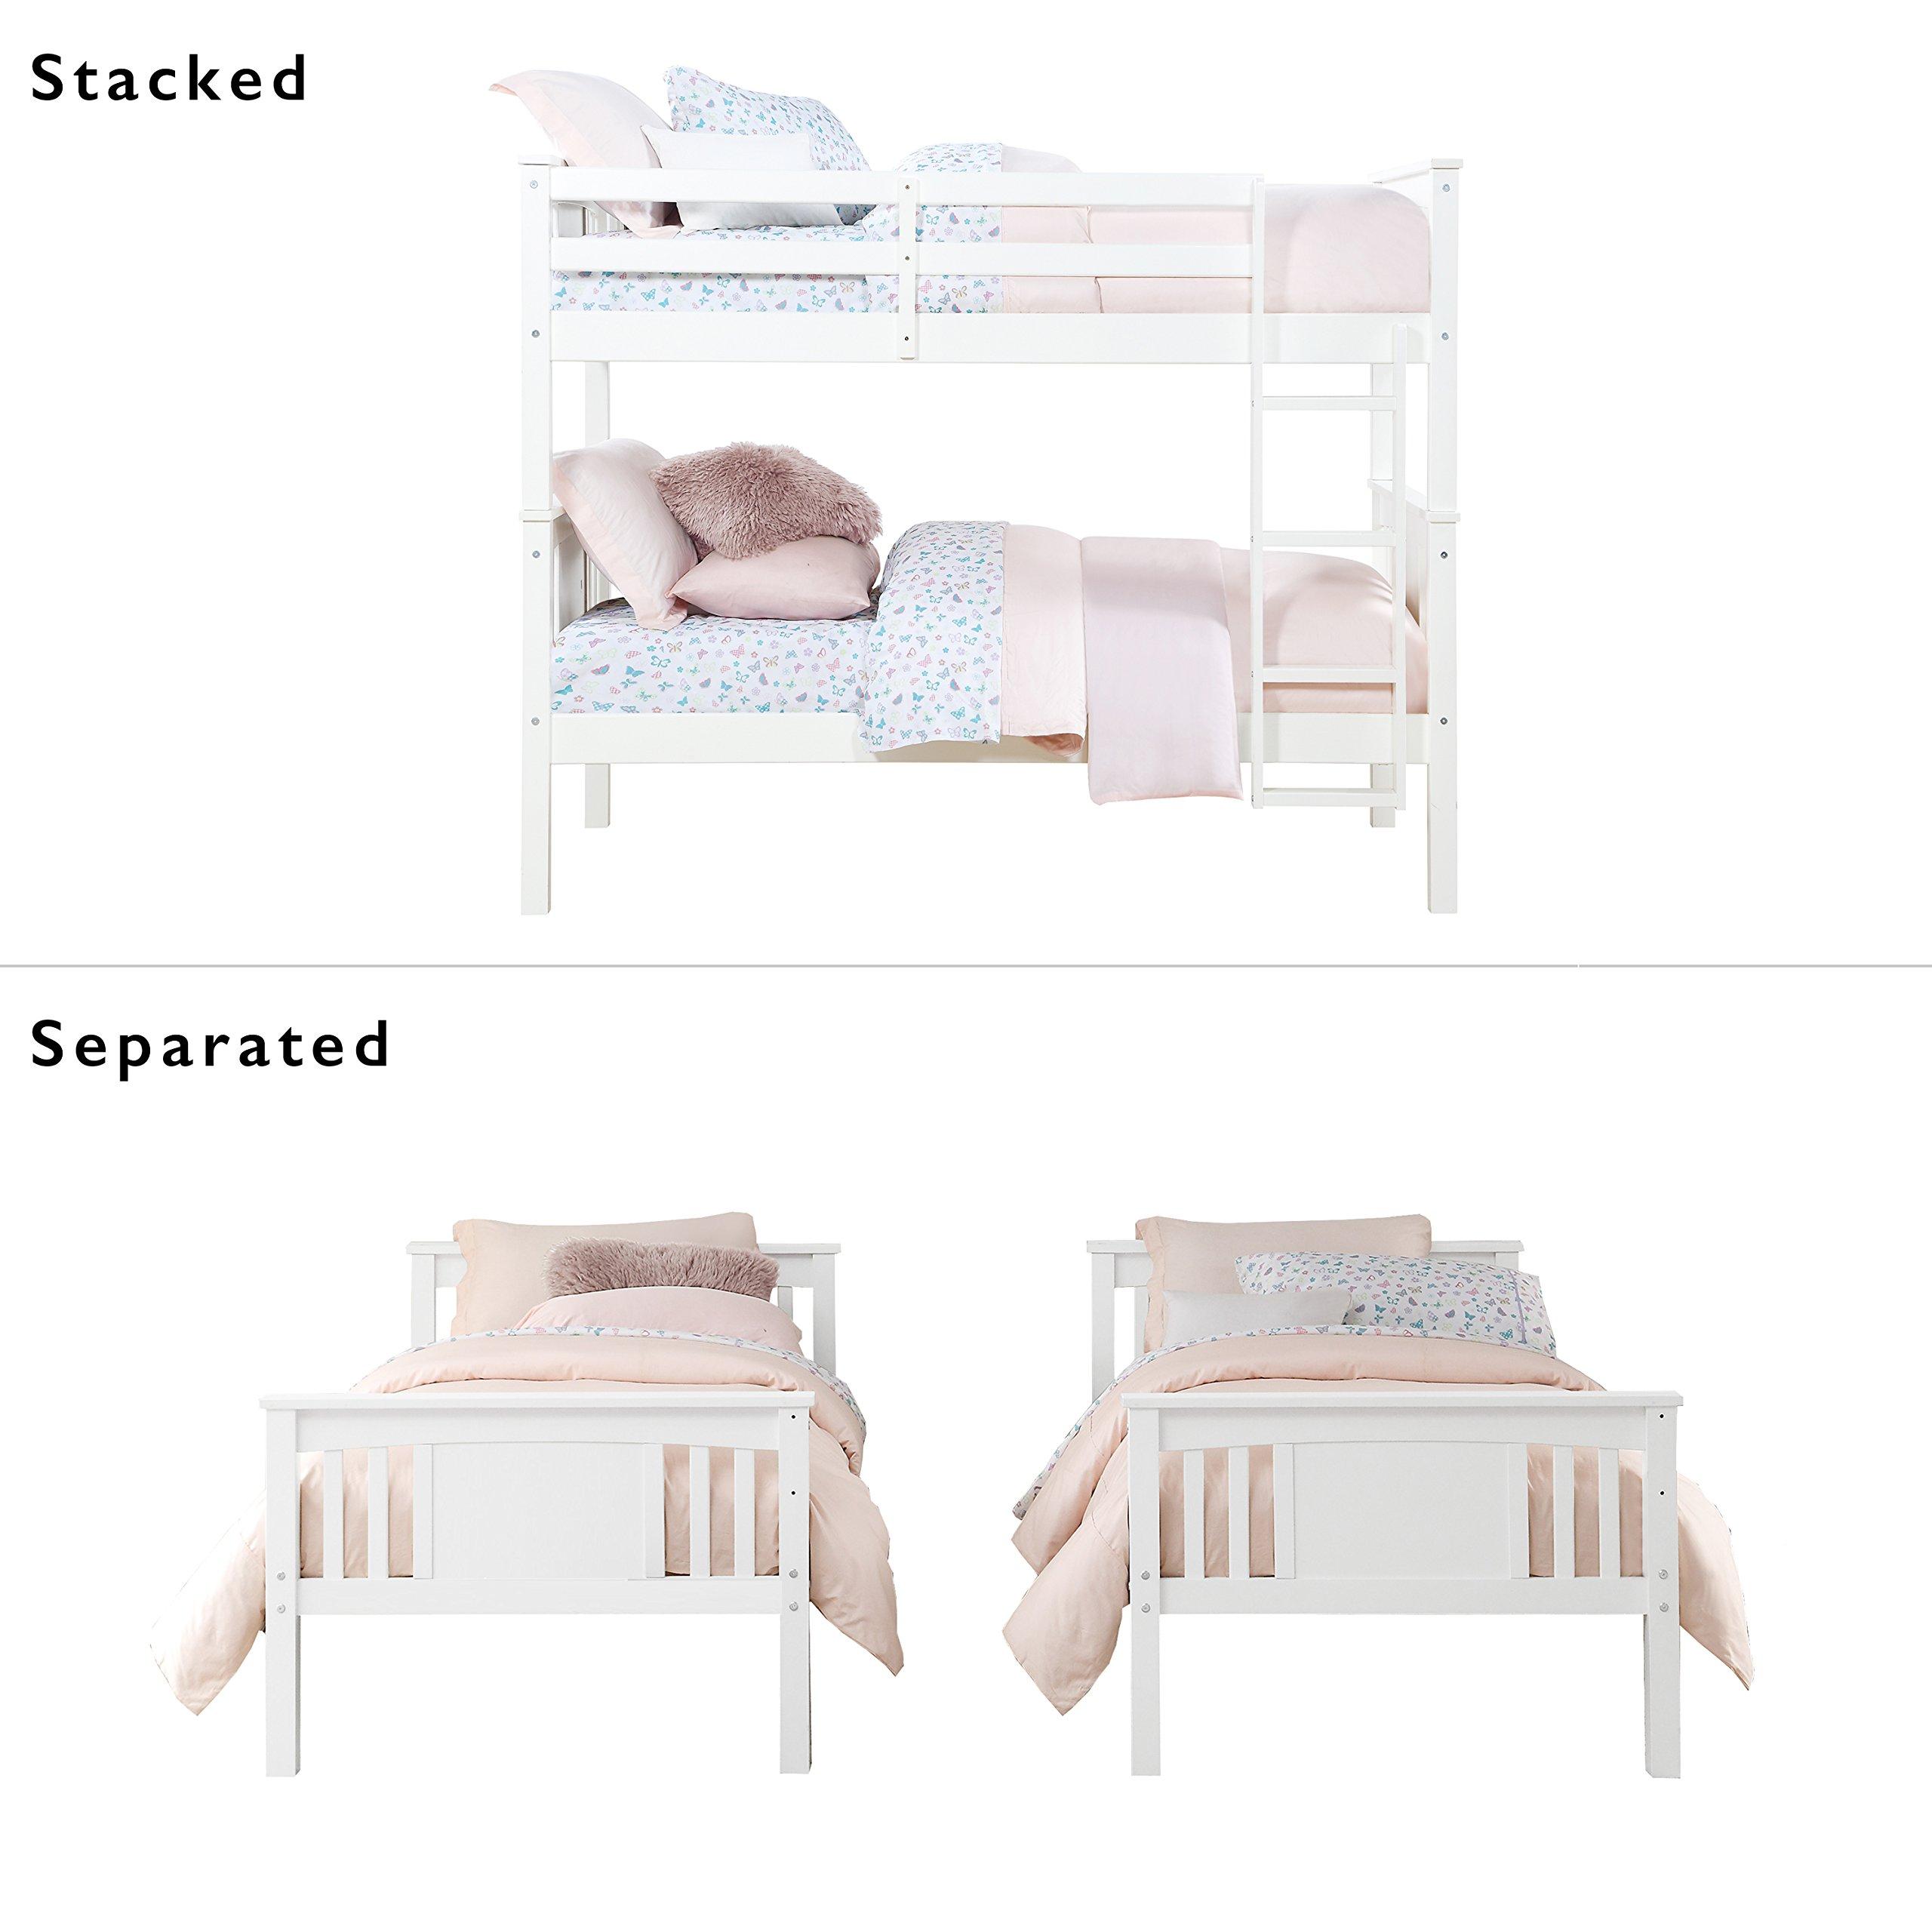 843fc73aadd3 Dorel Living Dylan Bunk Bed